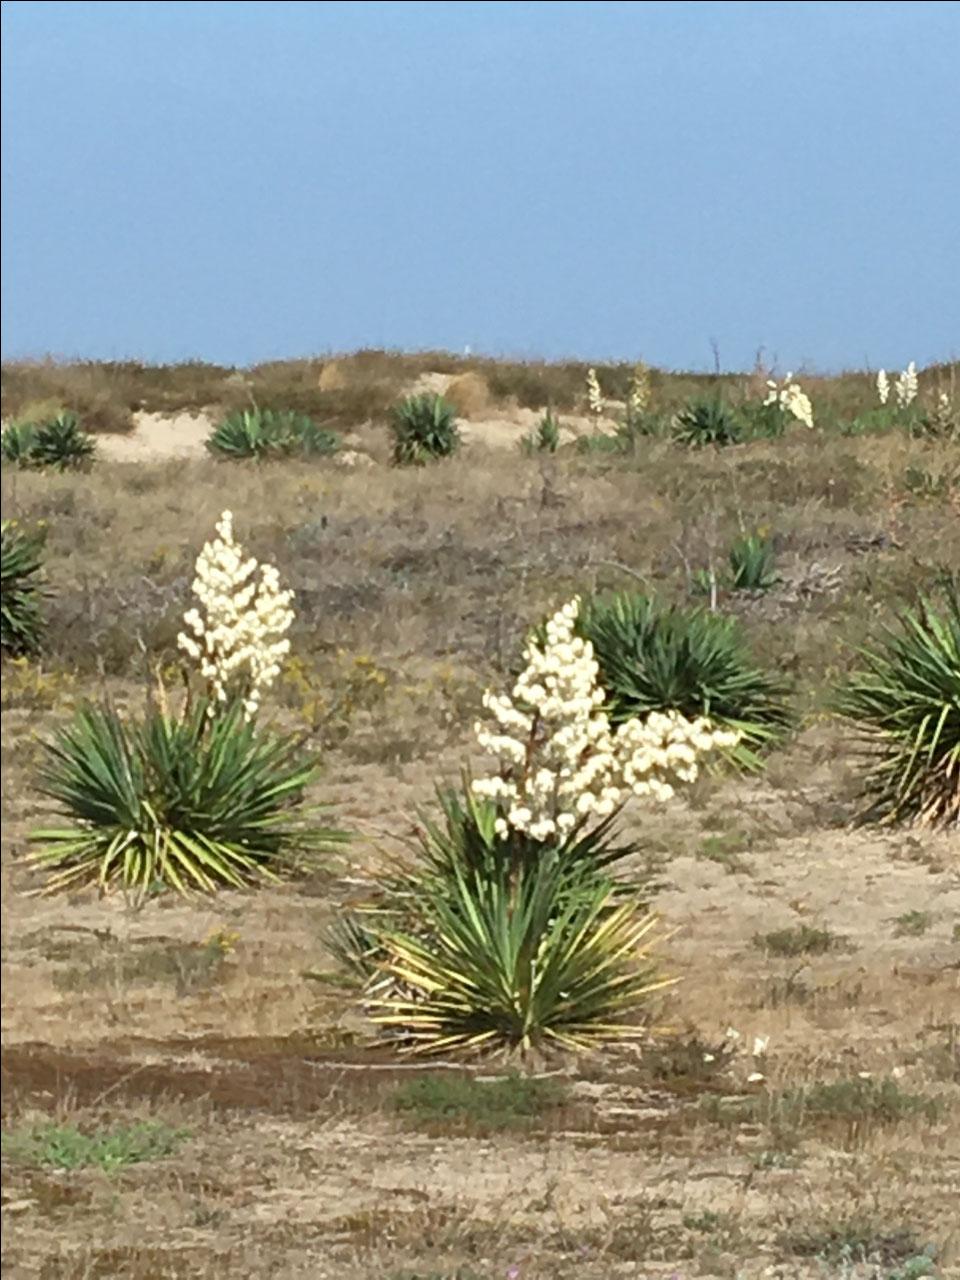 Interesting plants in the dunes